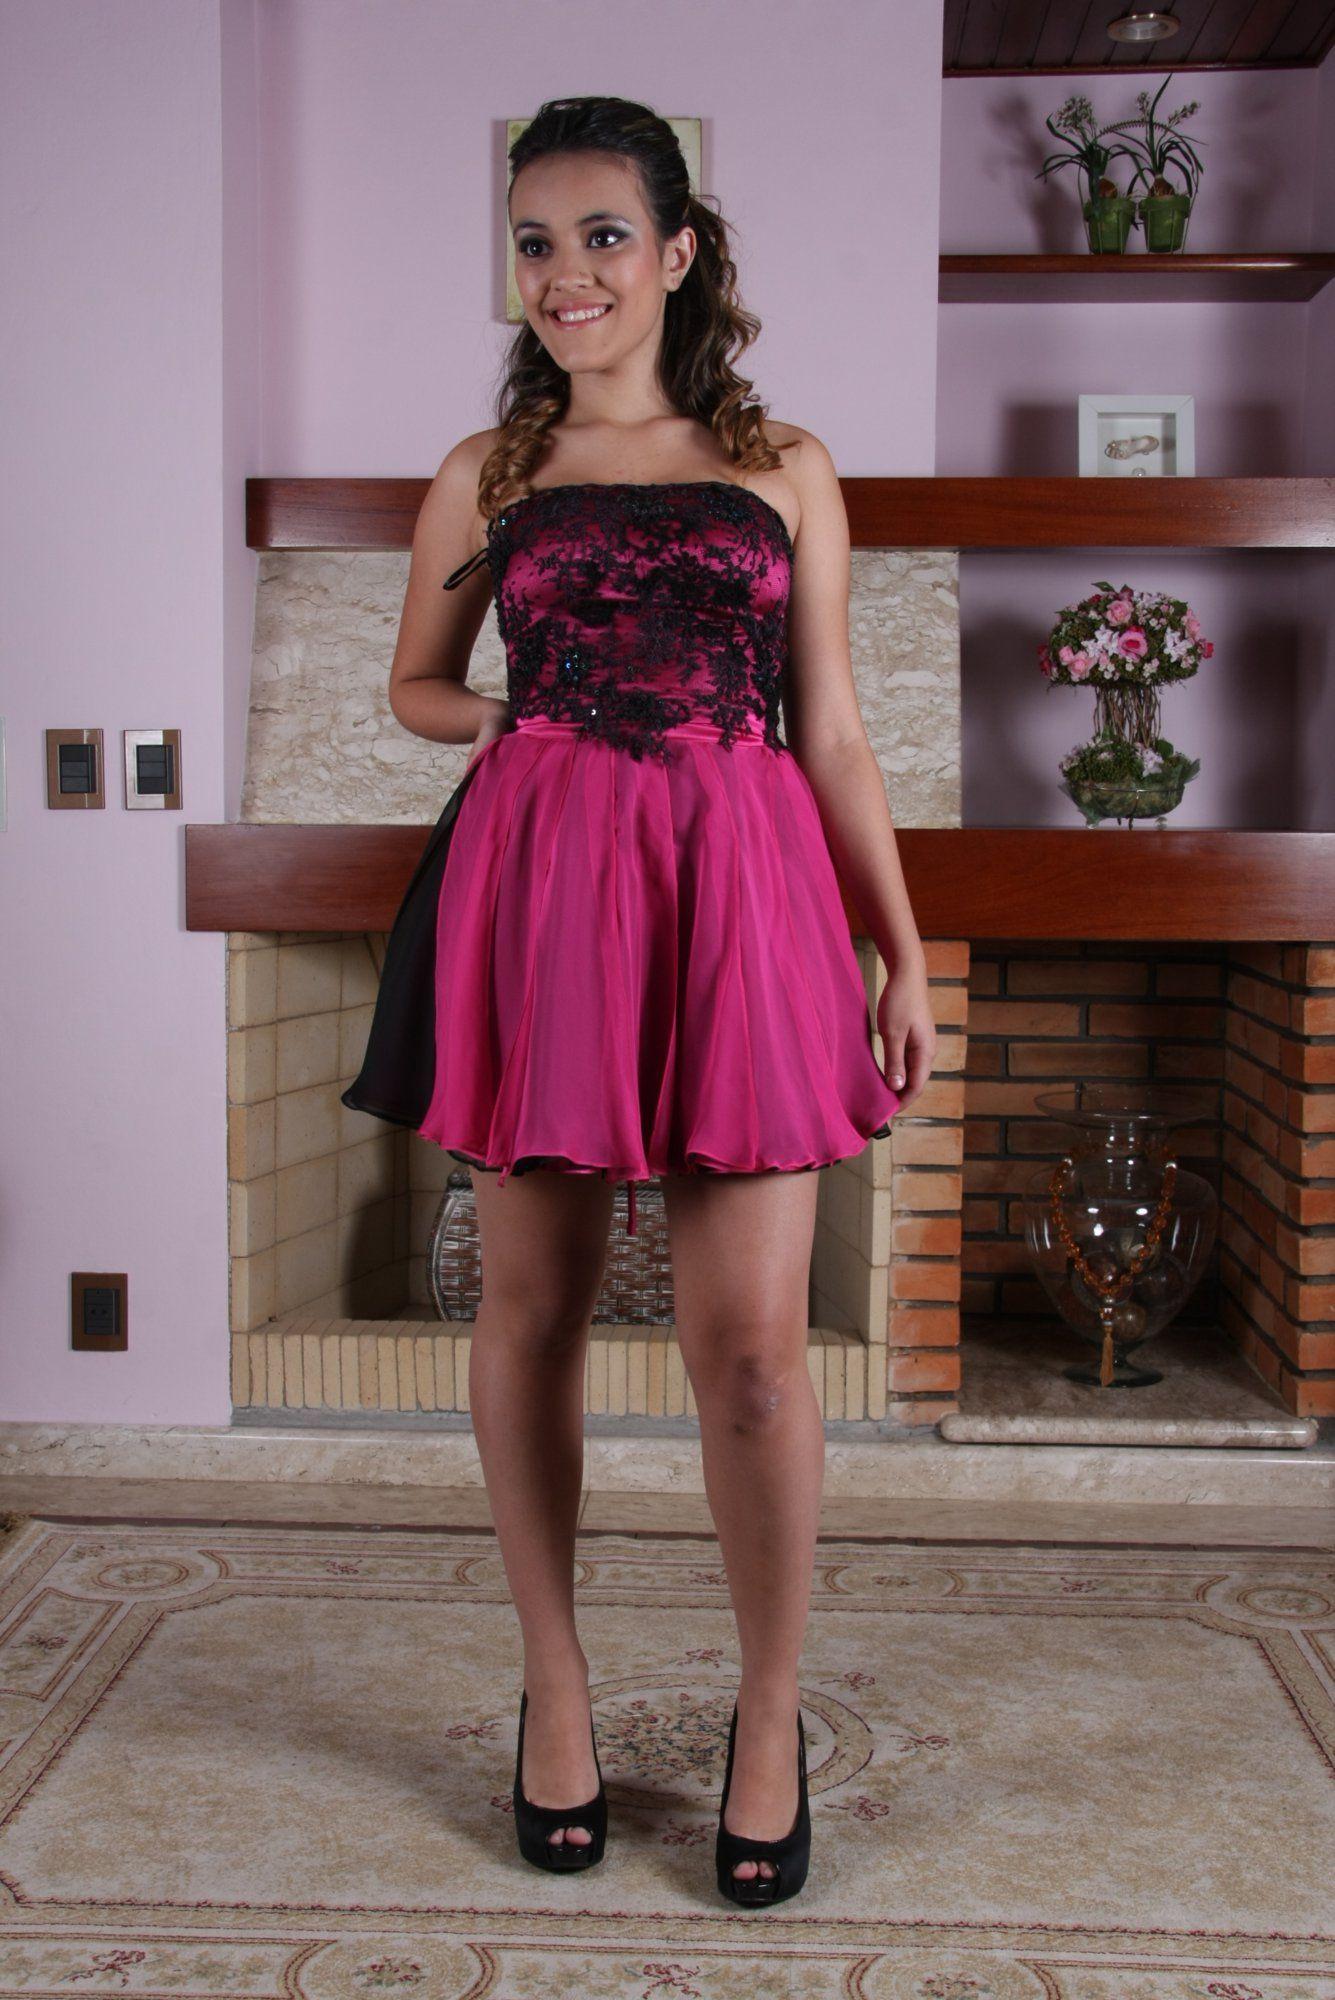 Vestido de Debutante Pink - 12 - Hipnose Alta Costura e Spa para Noivas e Noivos - Campinas - SP Vestido de Debutante, Vestido de Debutante Pink, Hipnose Alta Costura